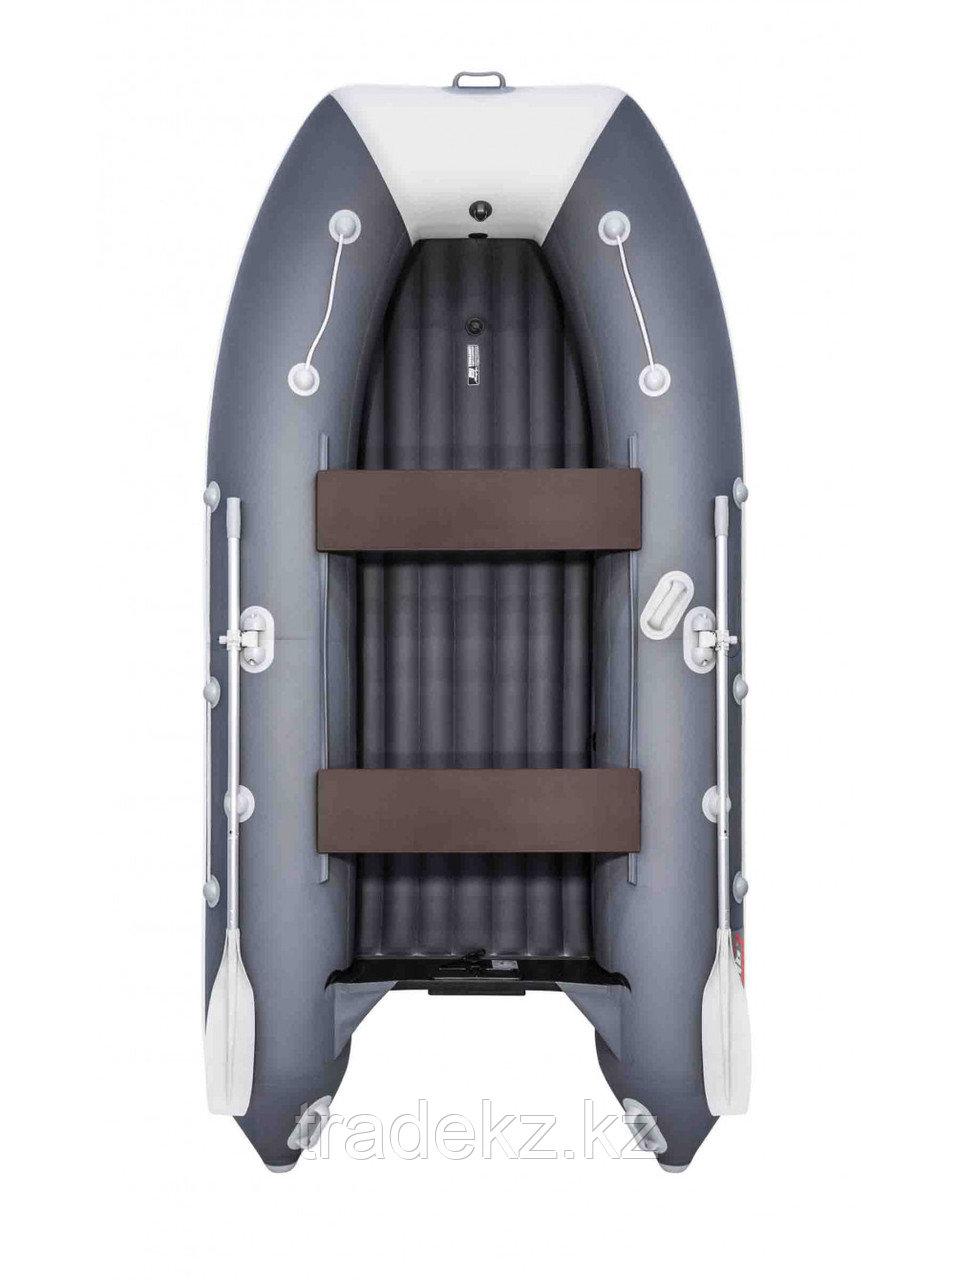 Лодка ПВХ Таймень LX 3600 НДНД графит/светло-серый